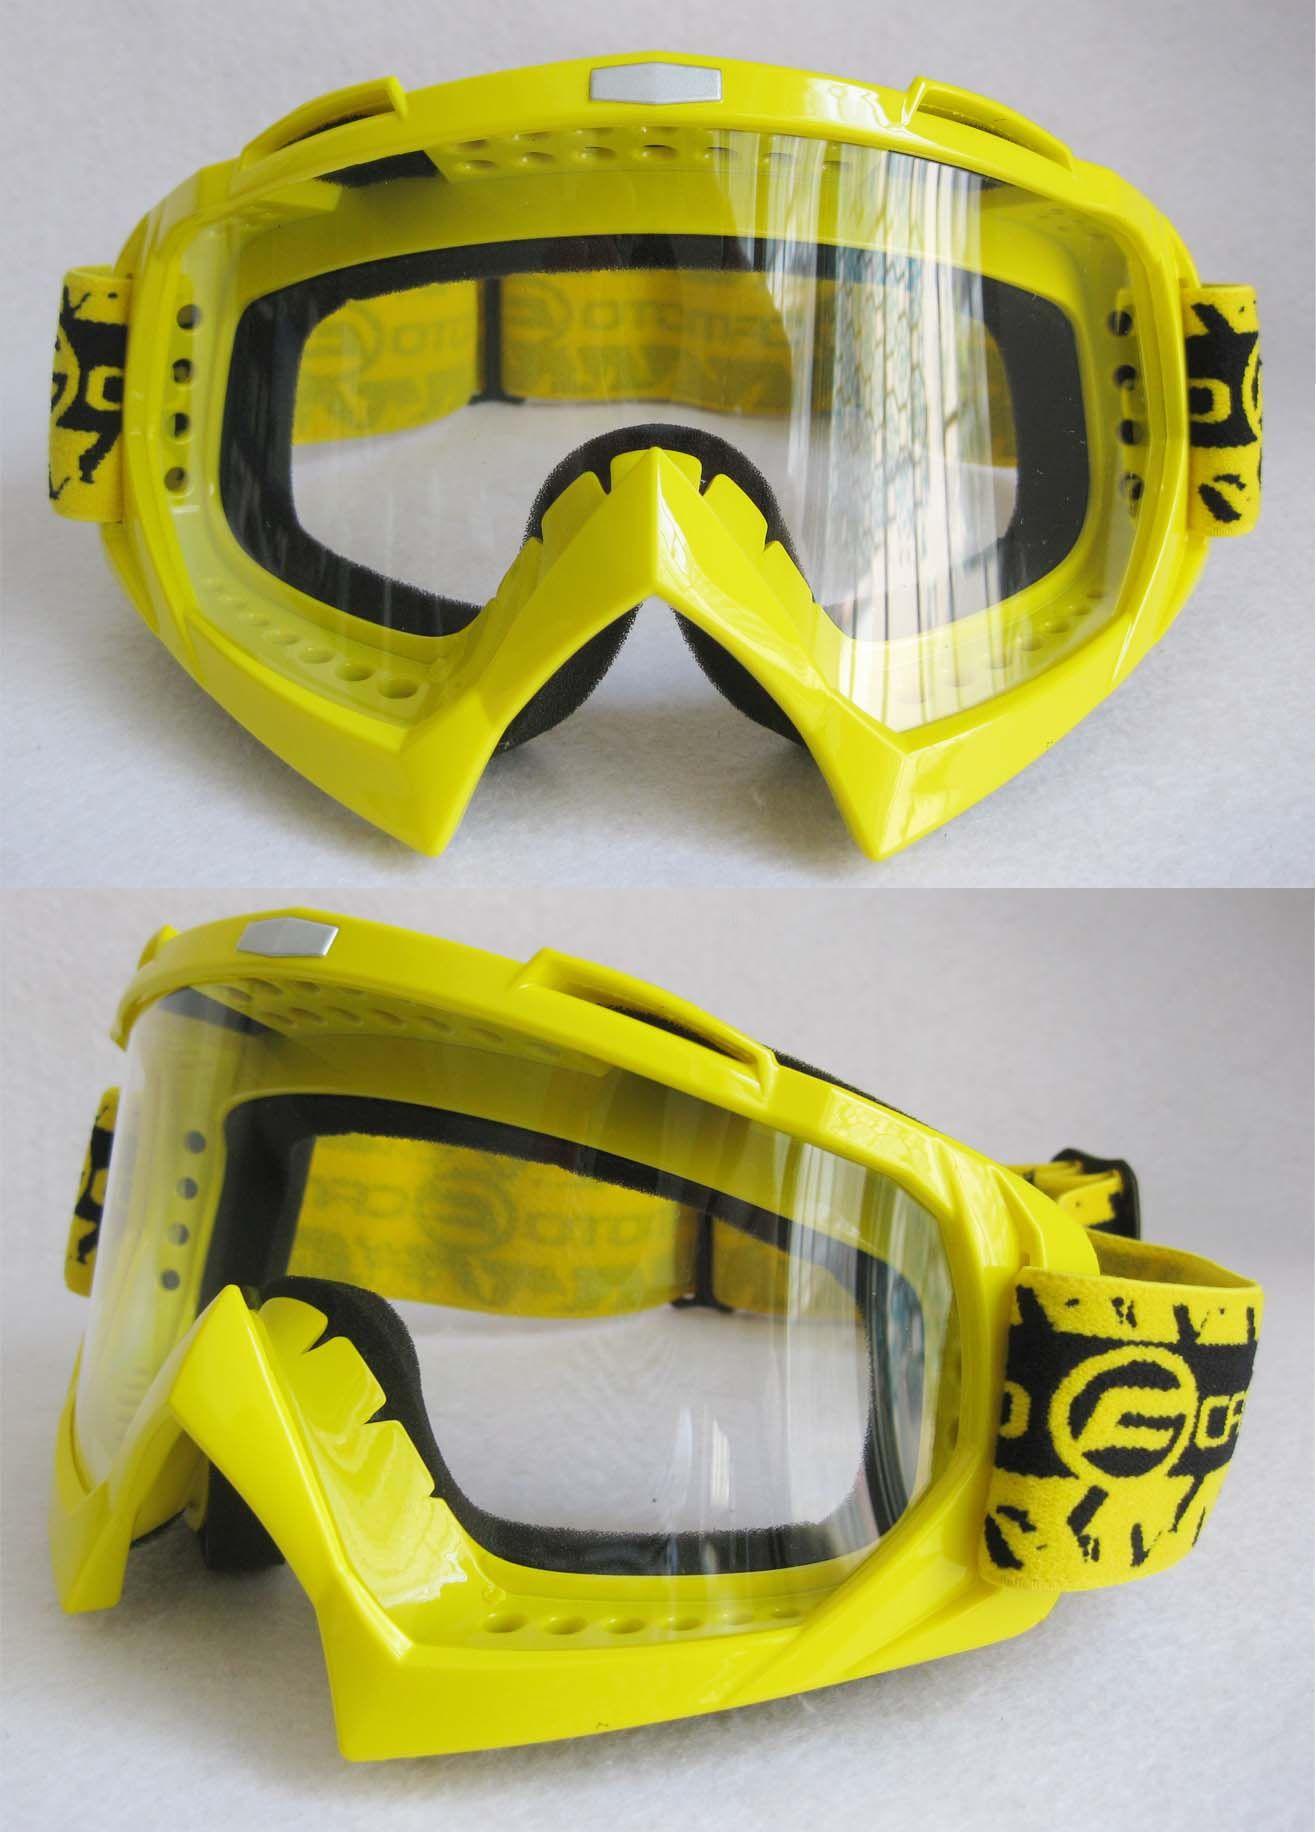 Motocycle Sunglasses